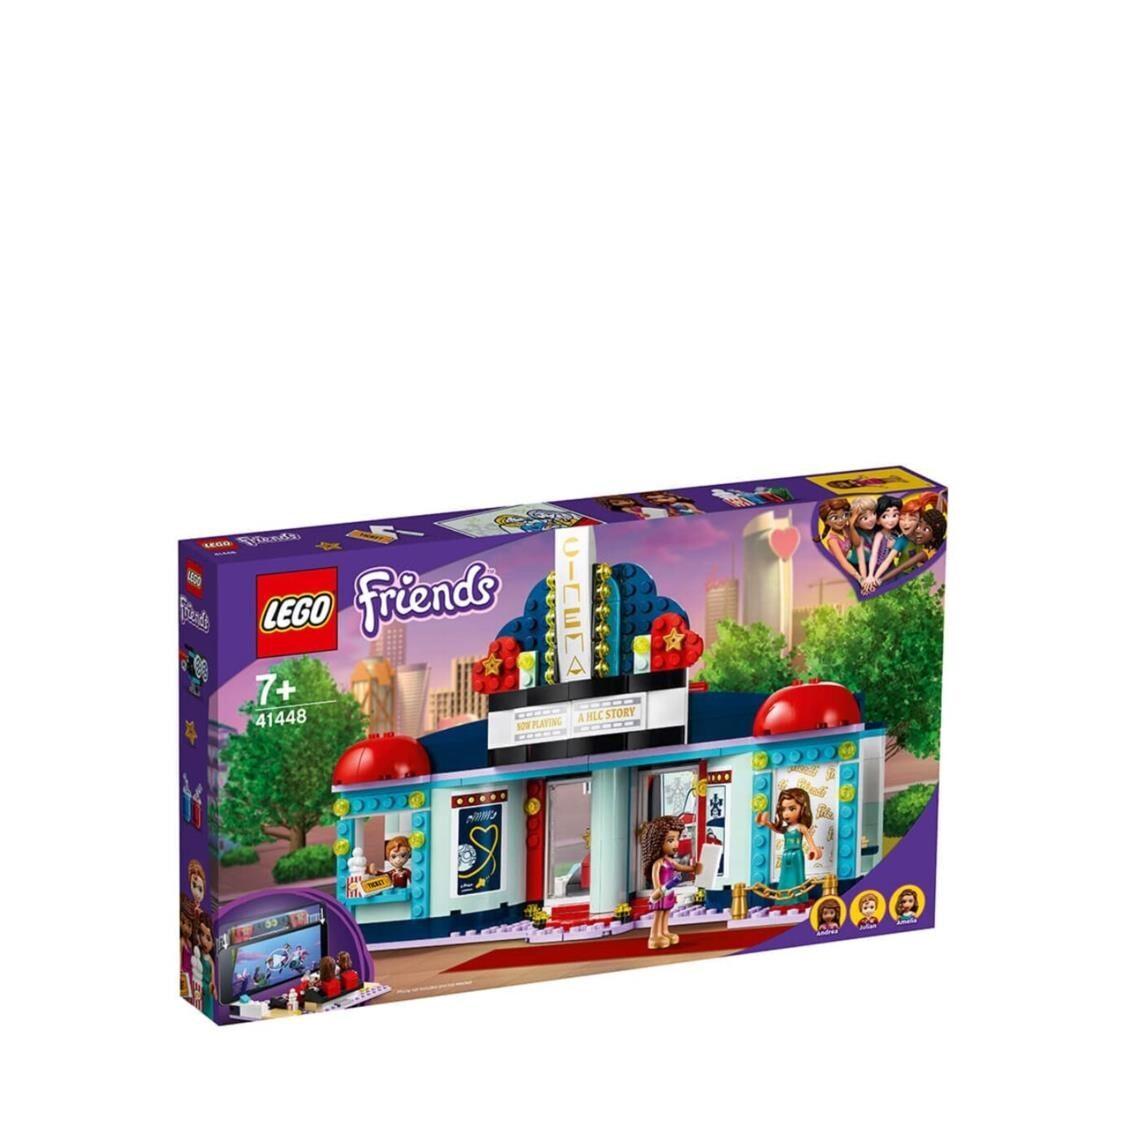 LEGO Friends - Heartlake City Movie Theater 41448